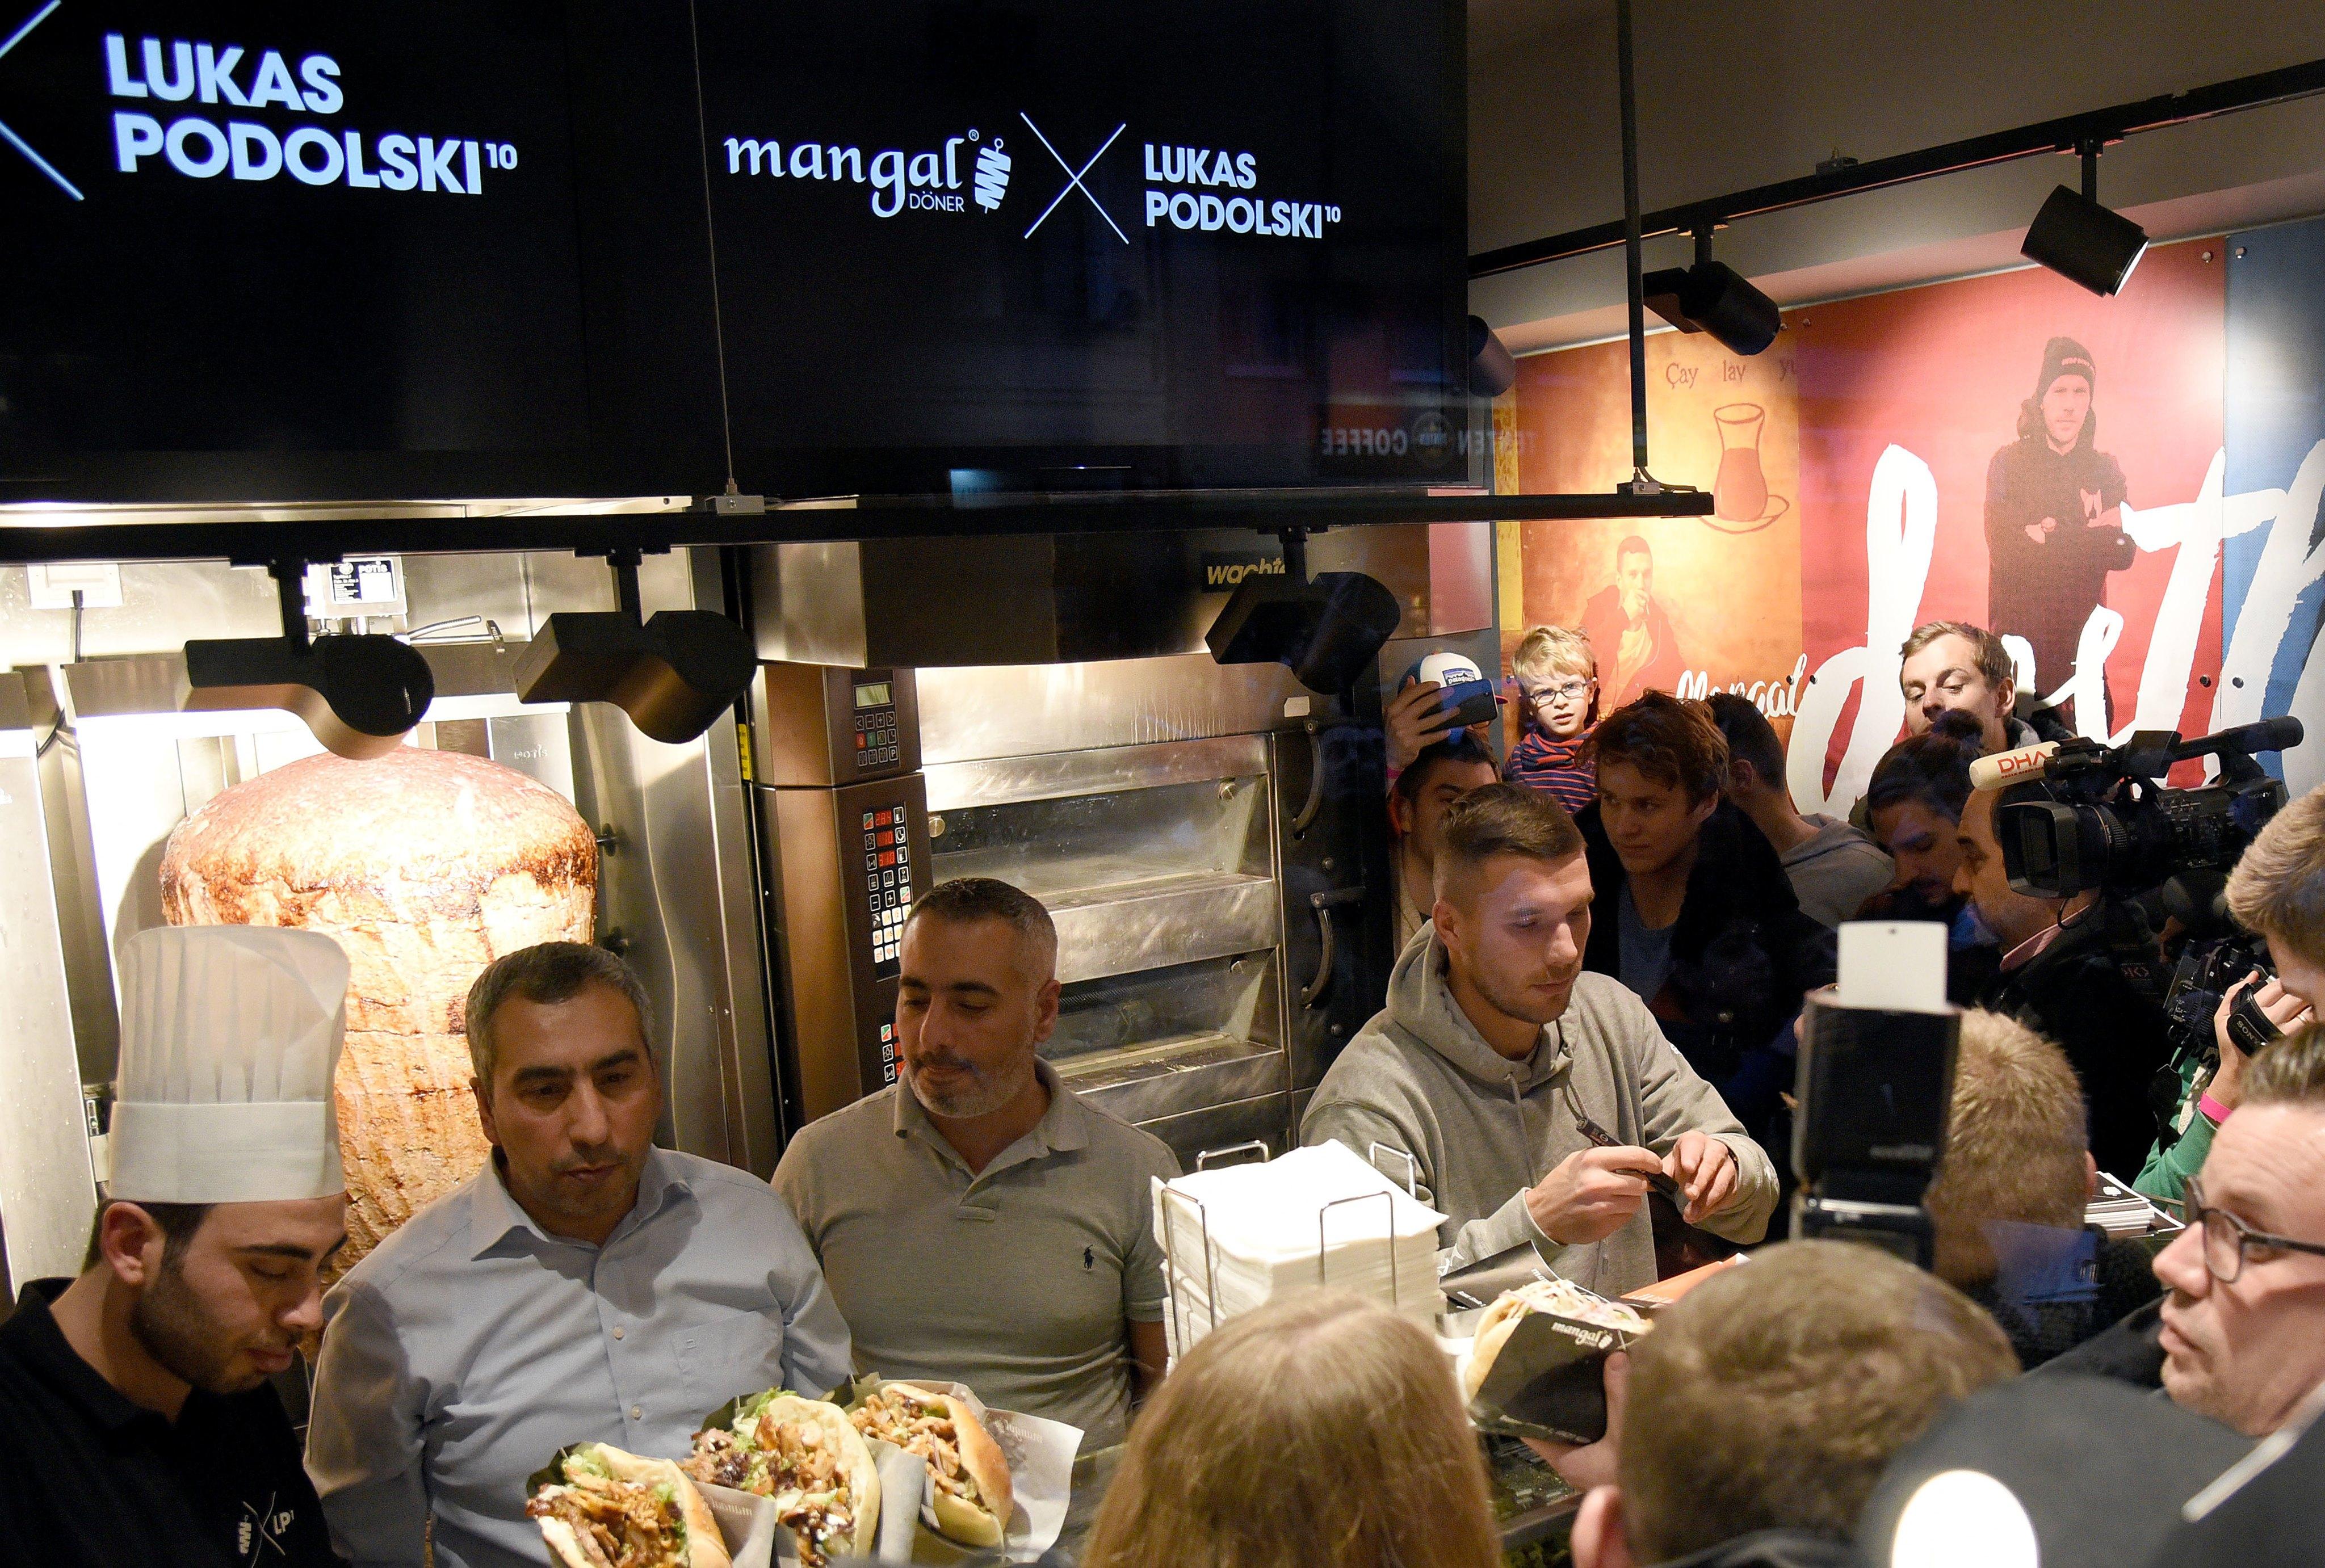 Podolski opens kebab restaurant